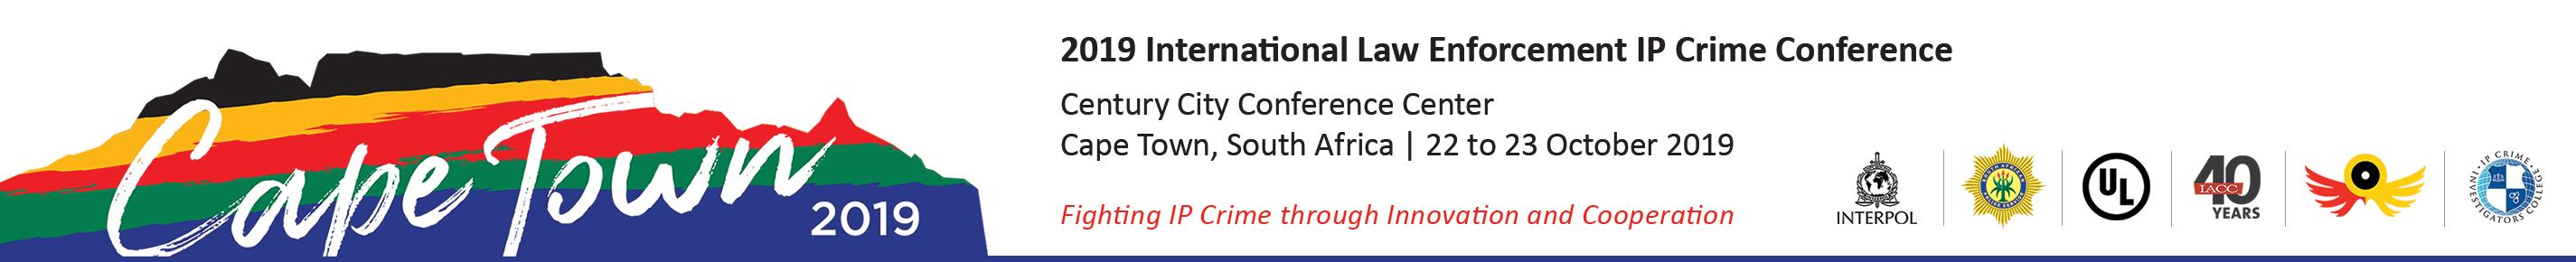 2019 International Law Enforcement IP Crime Conference